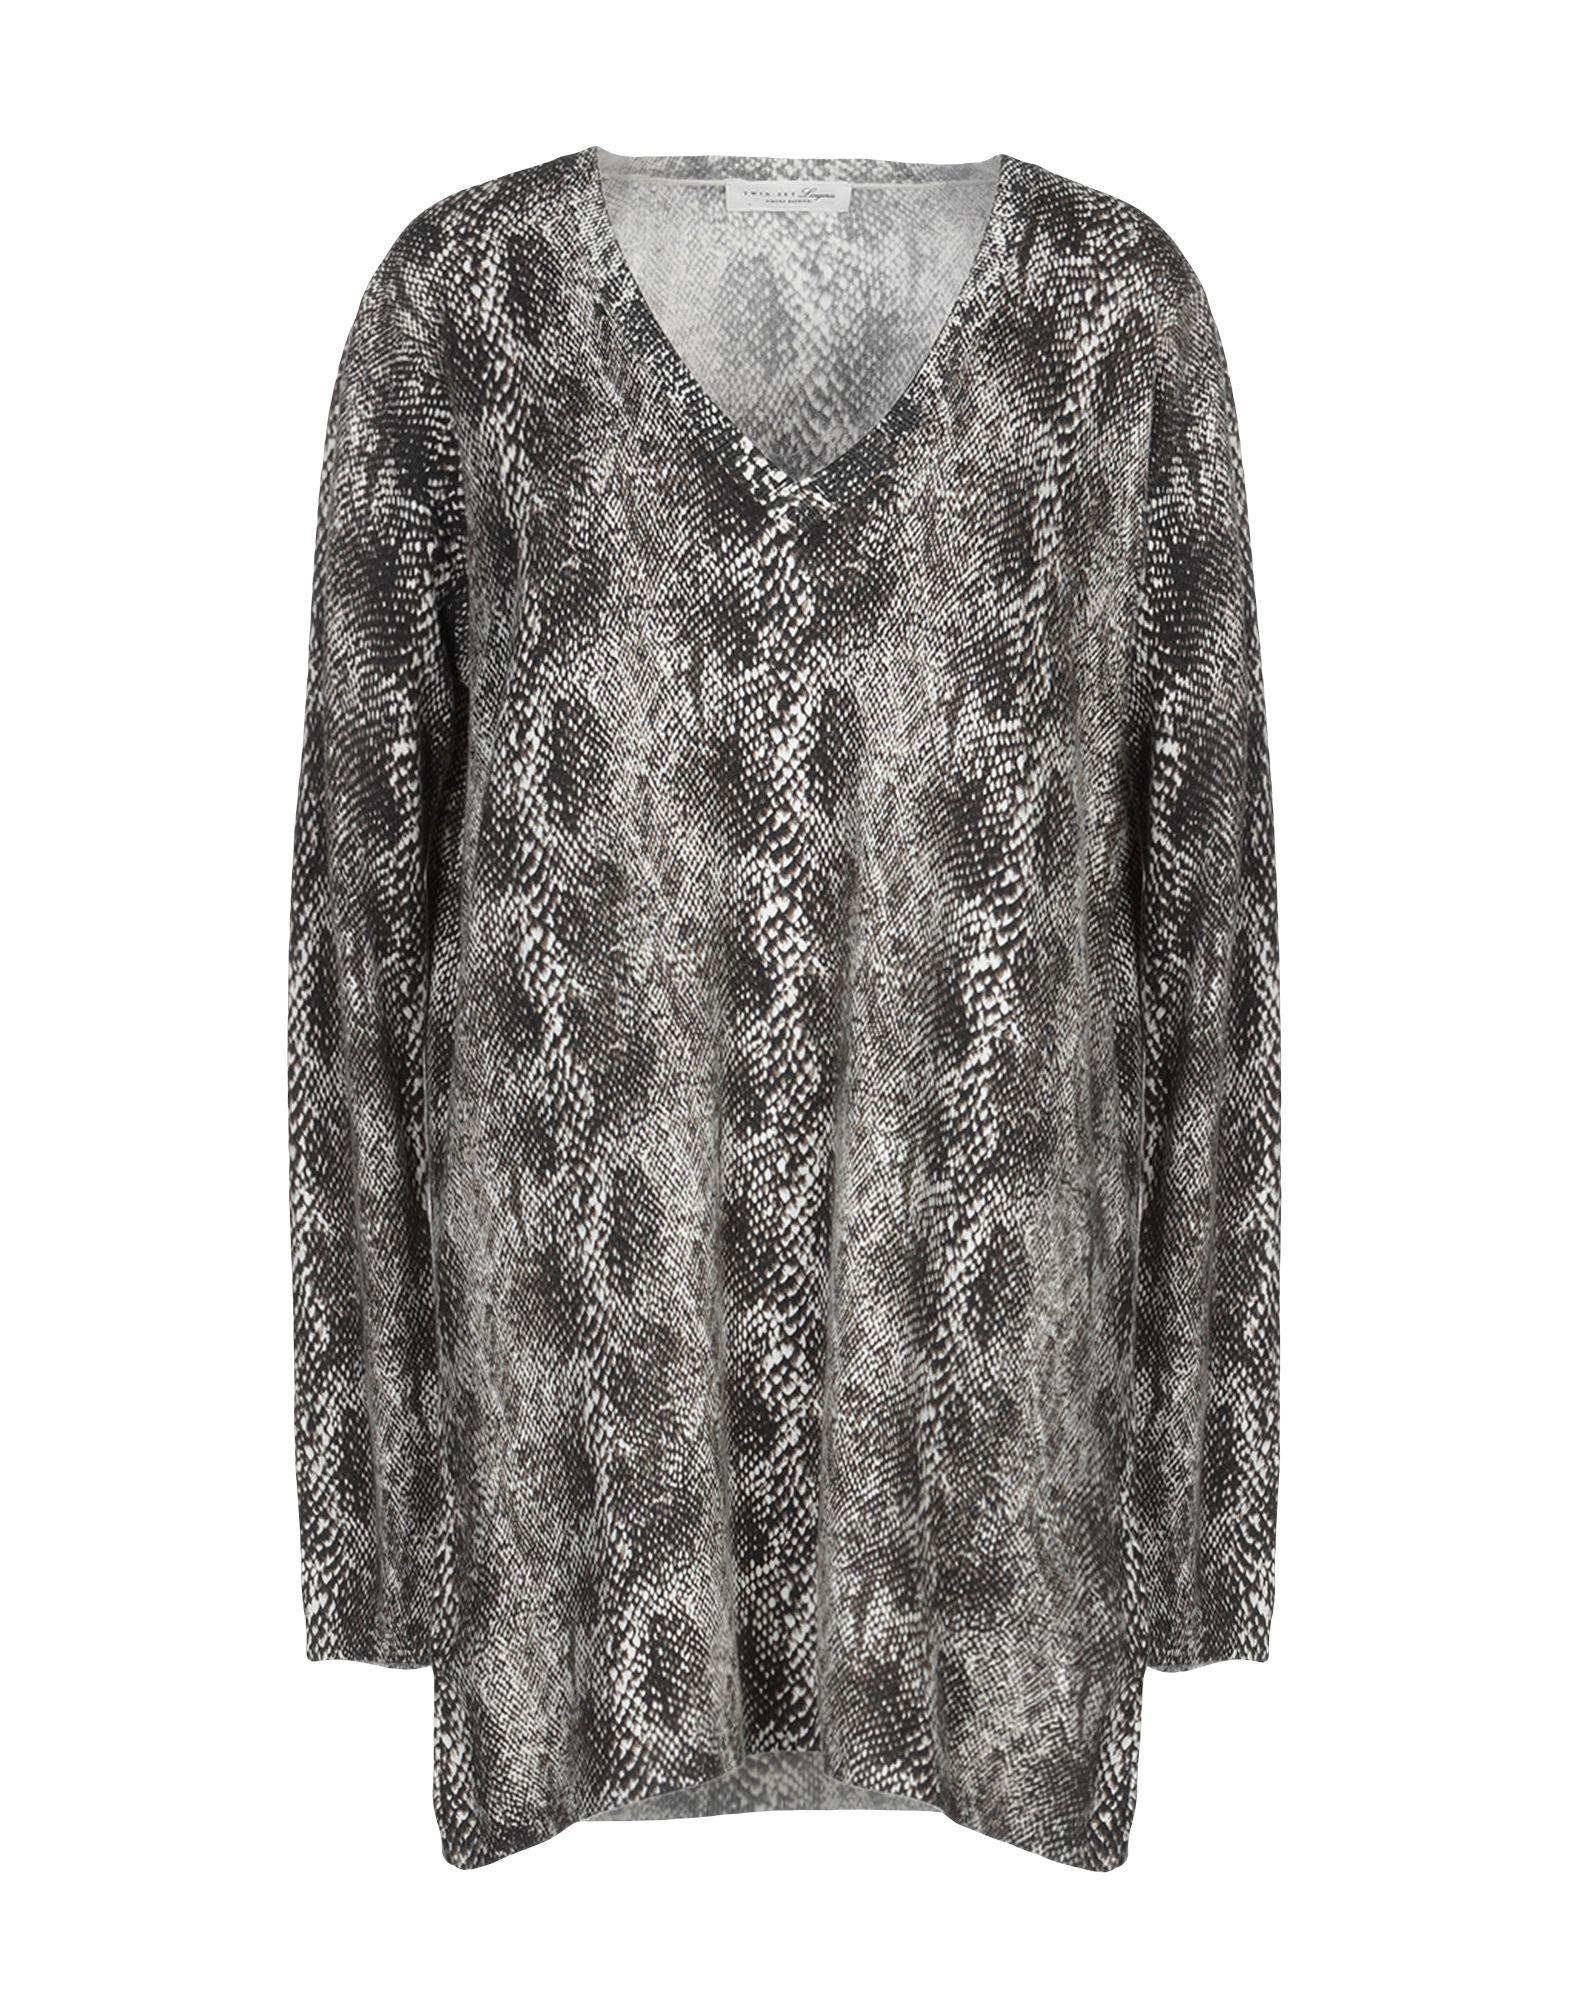 TWIN-SET LINGERIE Ночная рубашка black lace details v neck with no falsies lingerie set